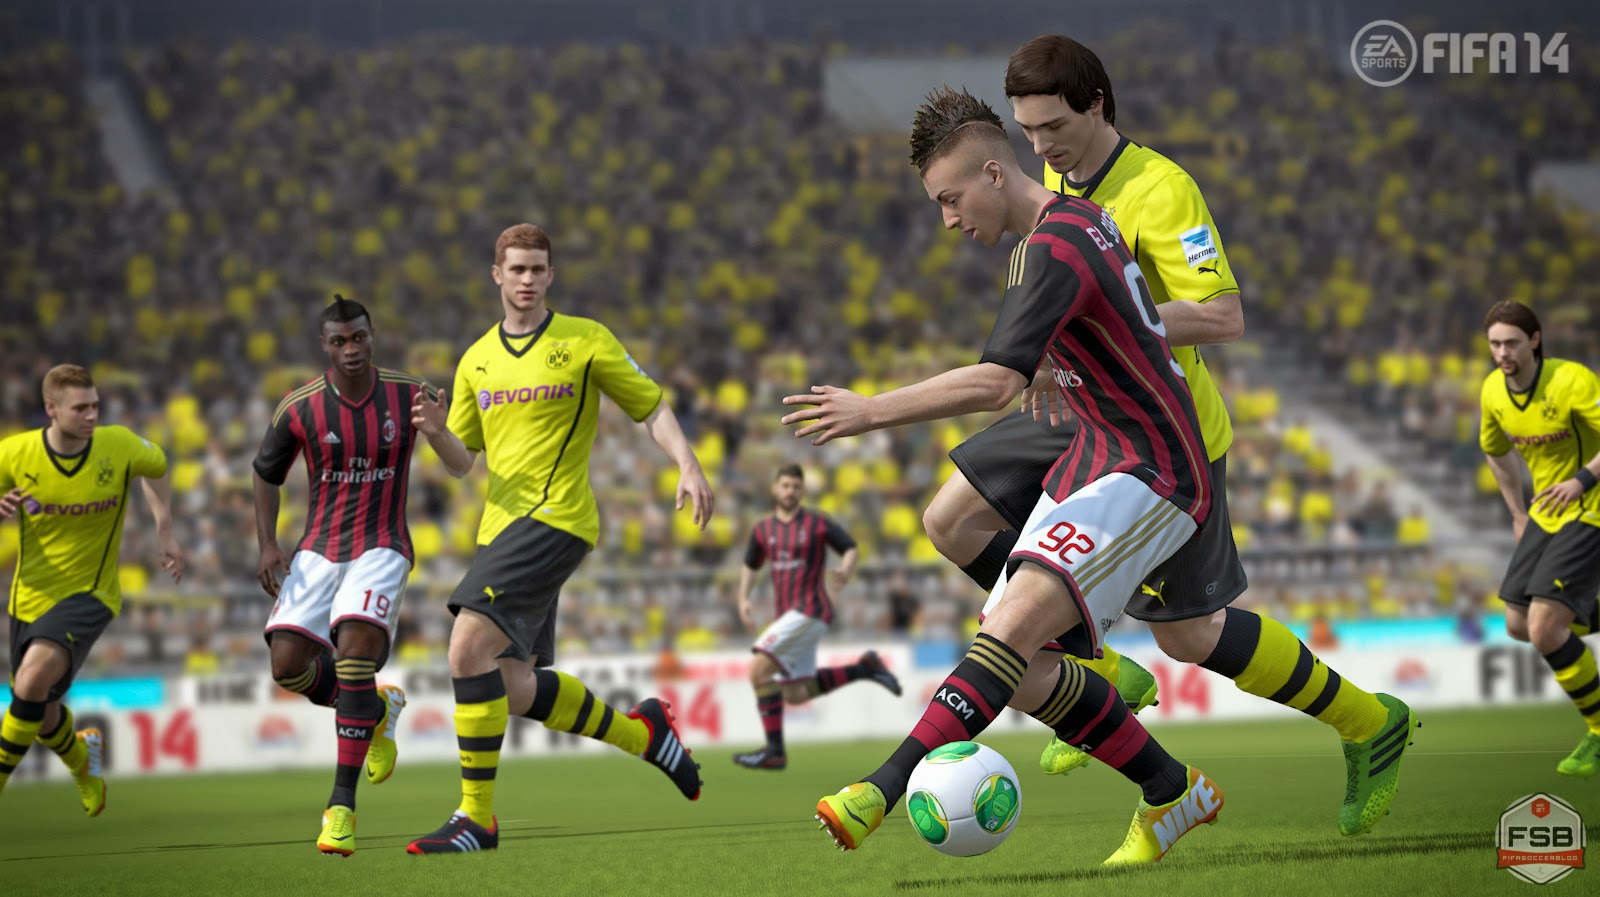 fifa 2014 pc free full download